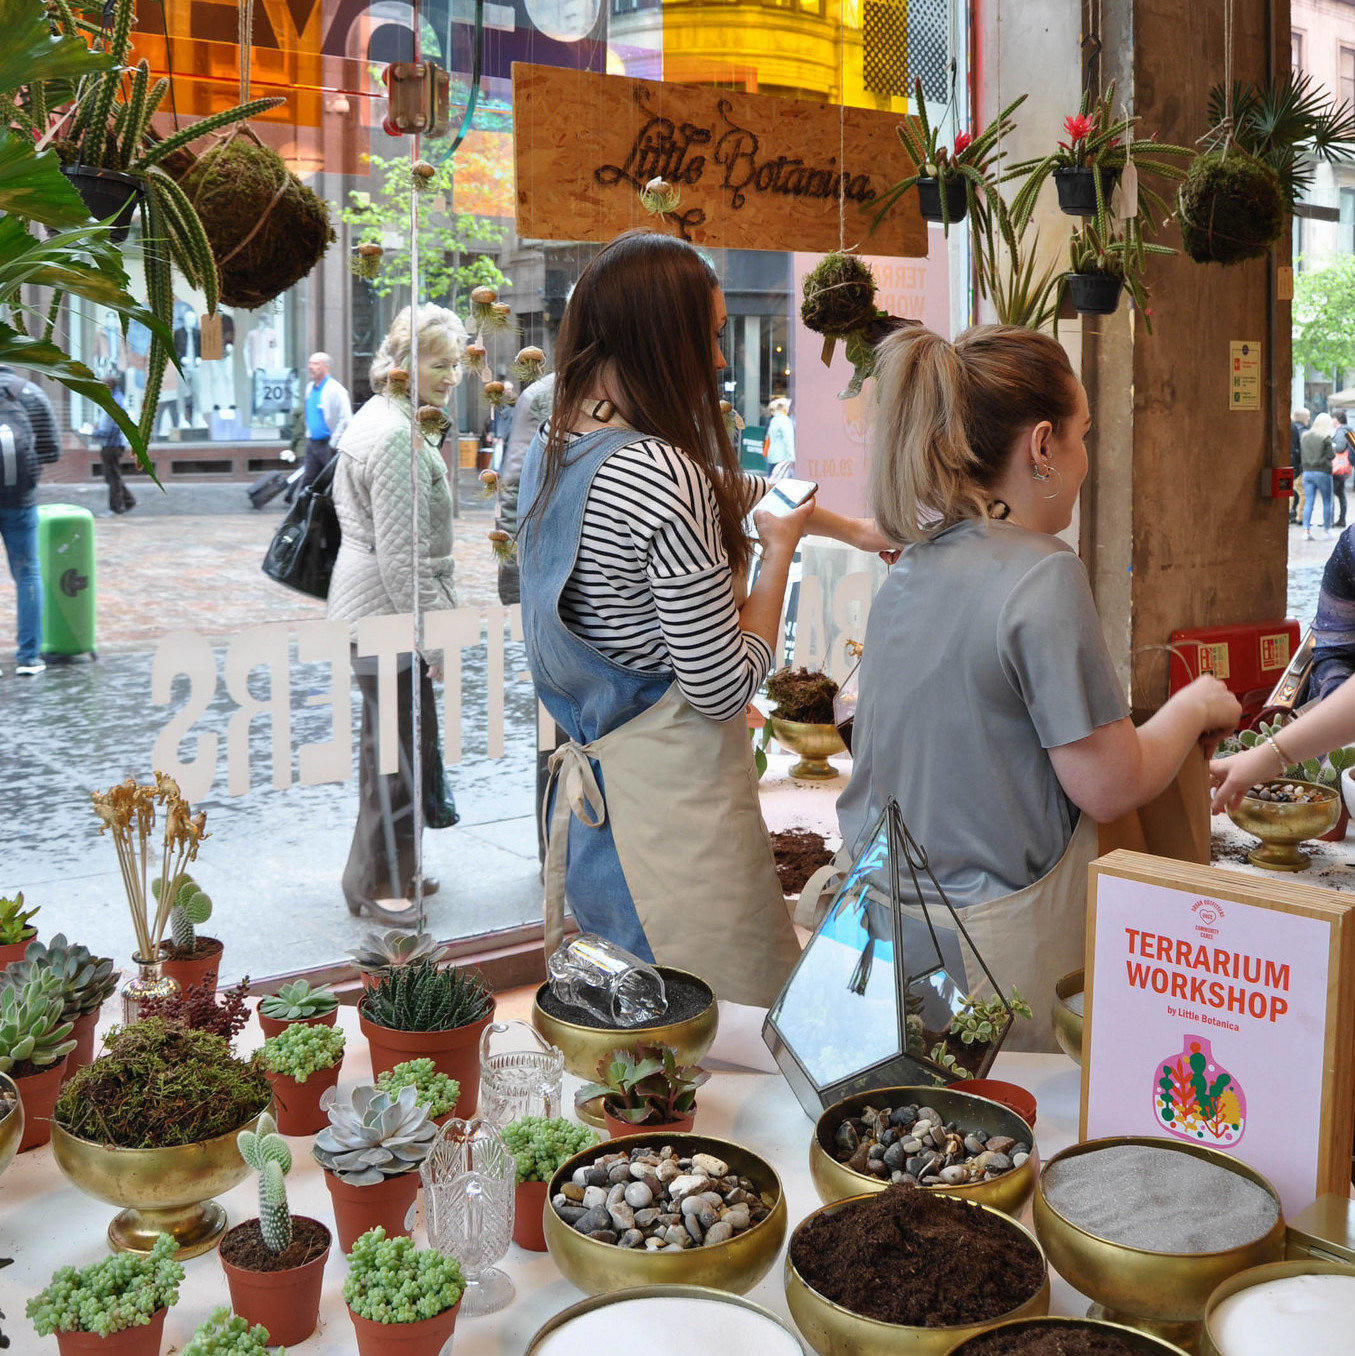 Pop-up terrarium workshop in Urban Outfitters, Buchanan Street, Glasgow.